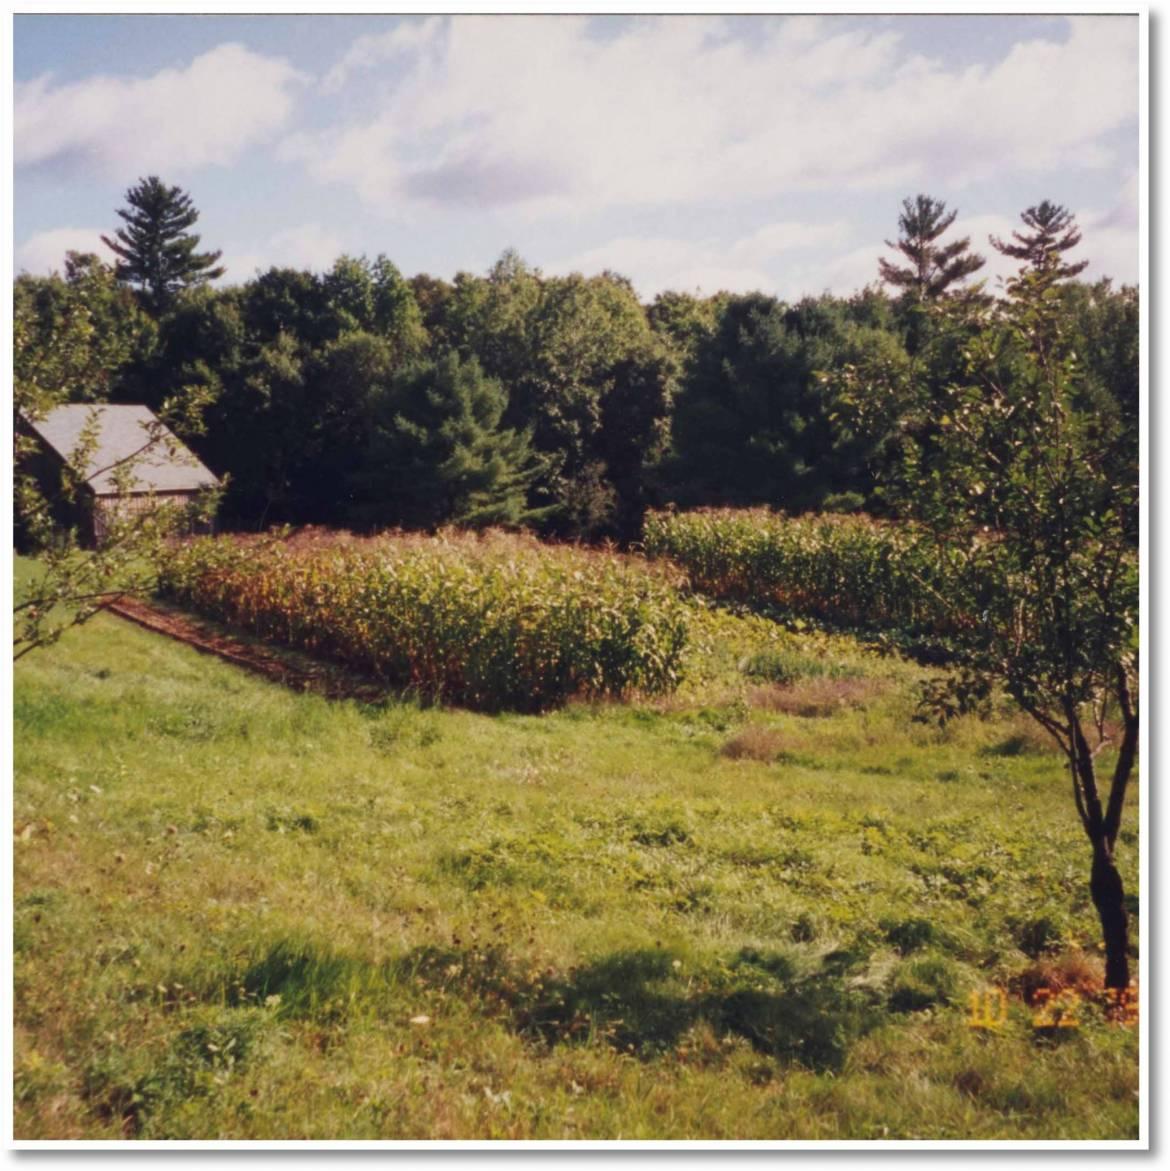 corn-crop-scaled.jpg